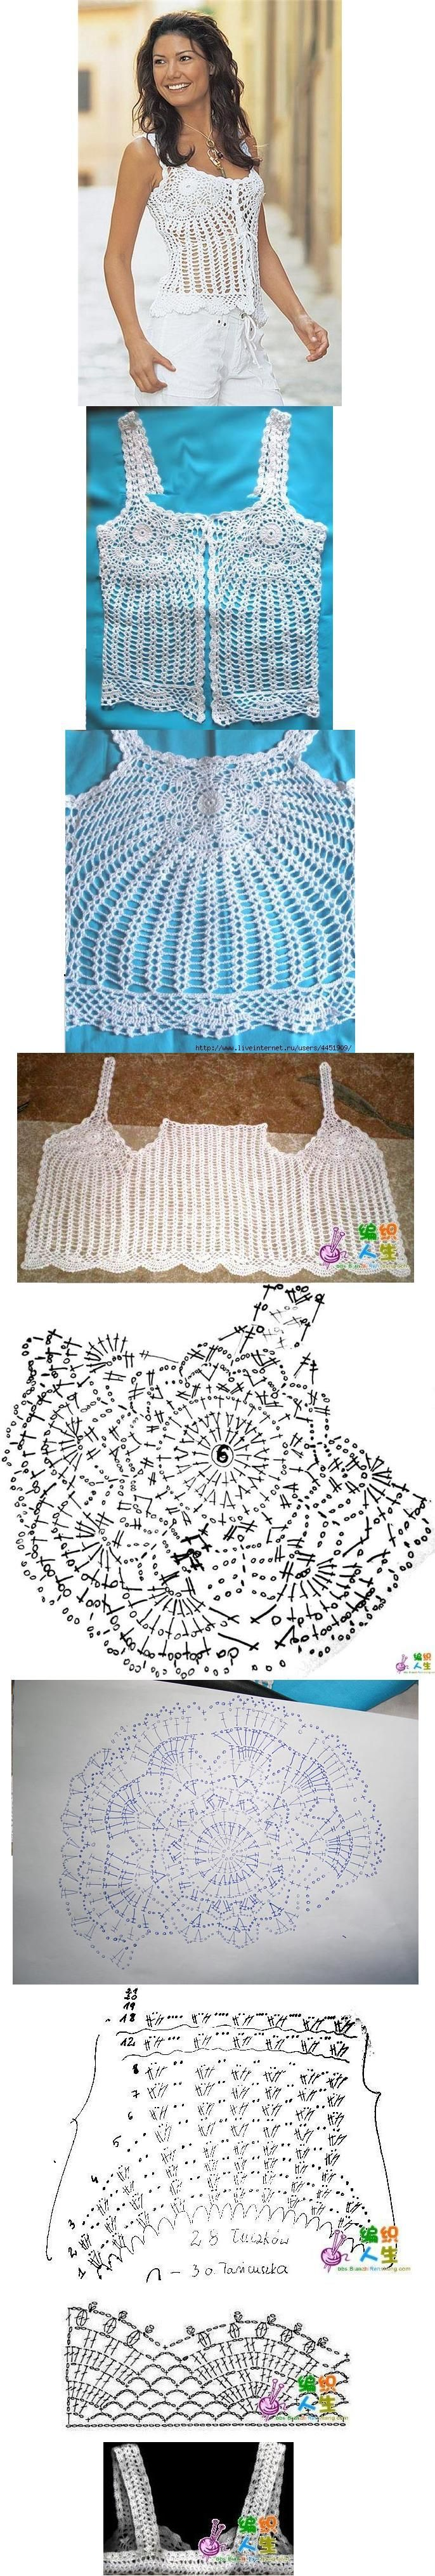 21 best croche tunisiano images on Pinterest | Tunisian crochet ...